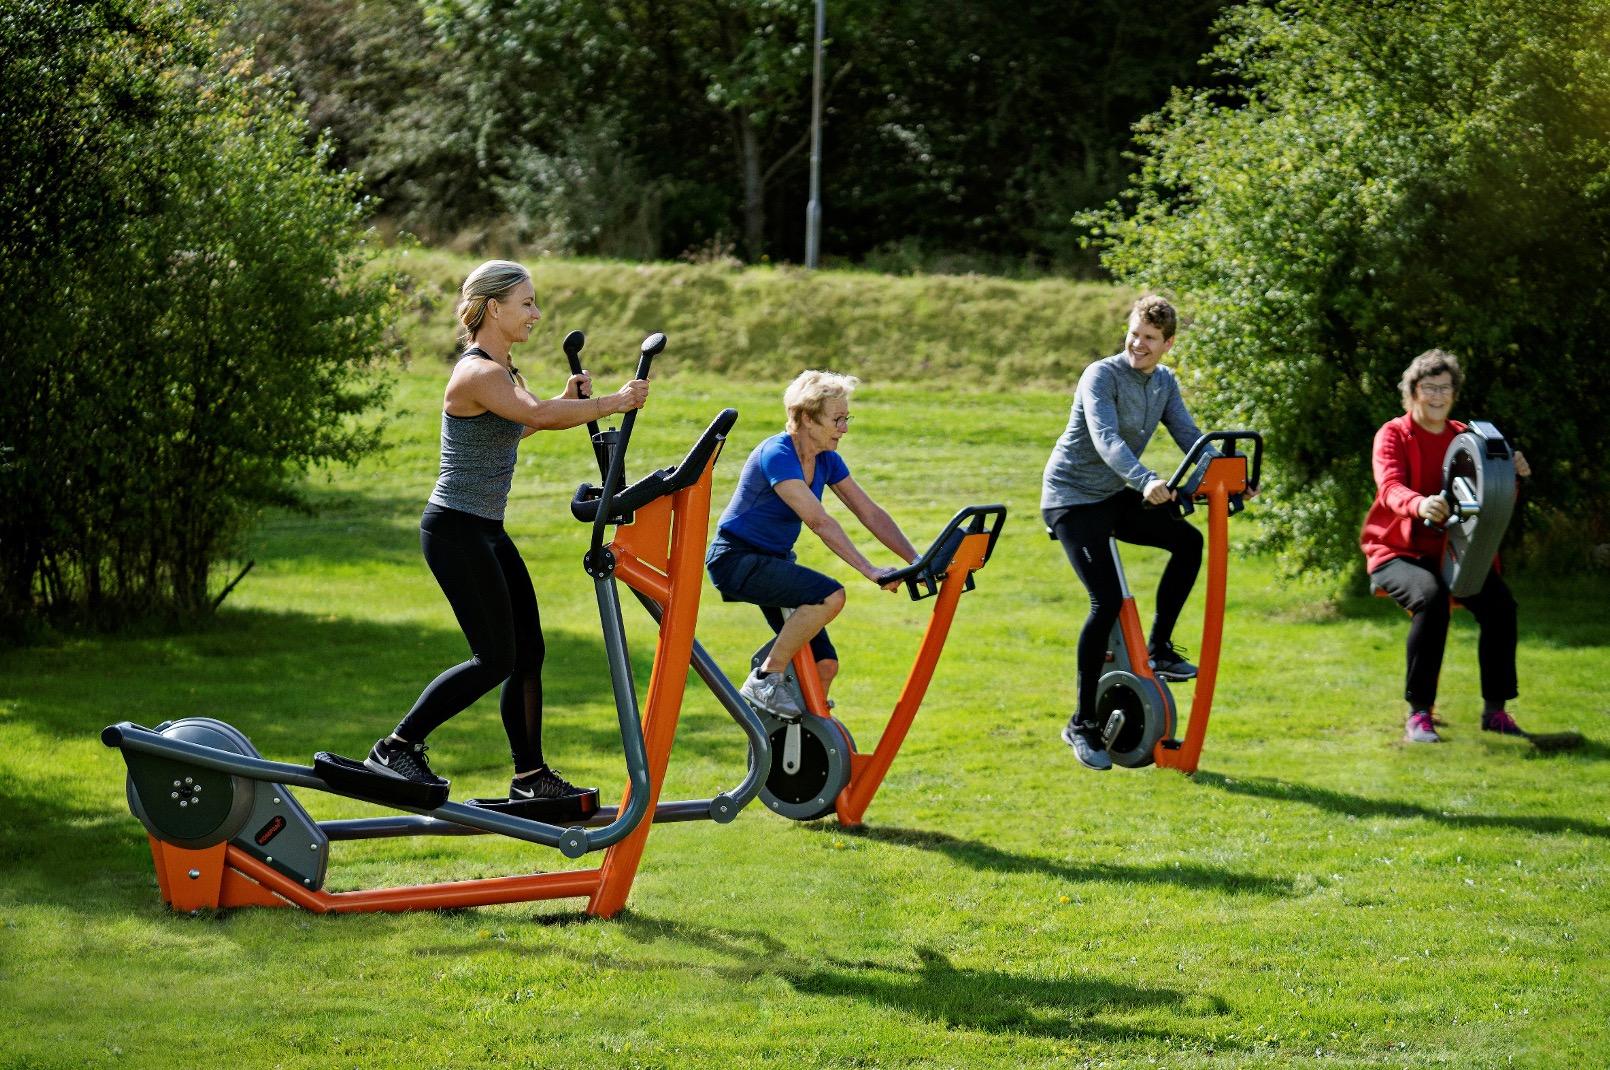 KOMPAN Fitness Equipment for Adults